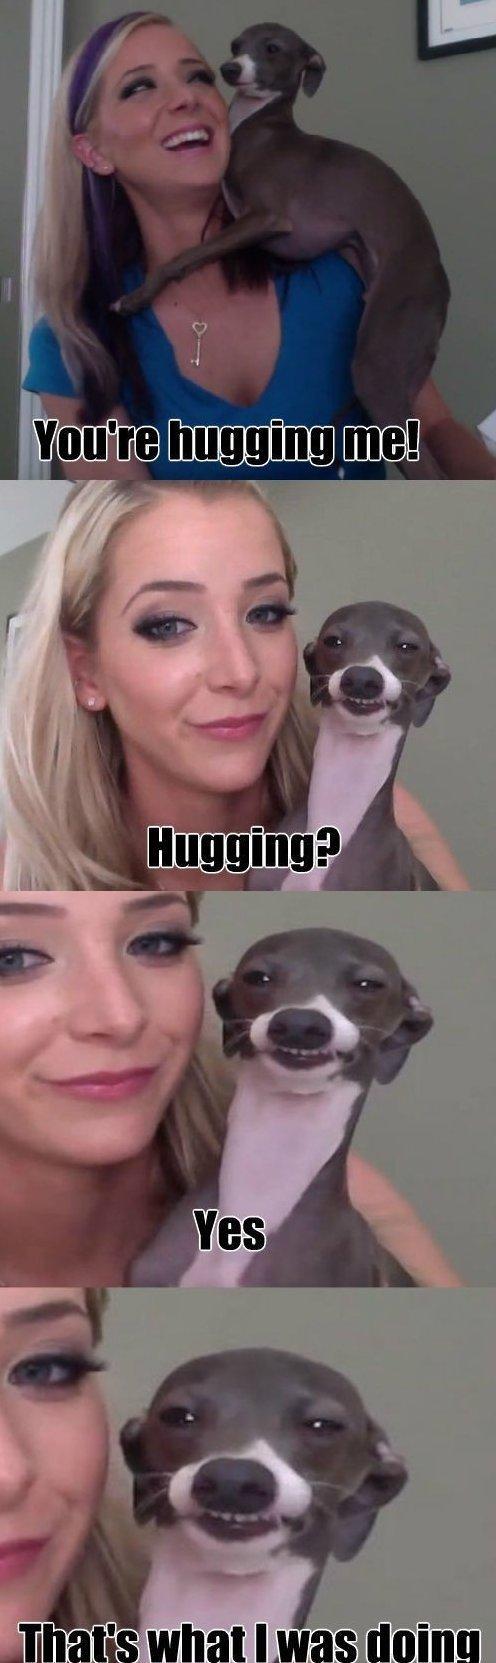 hugging. .. You lucky bastard.